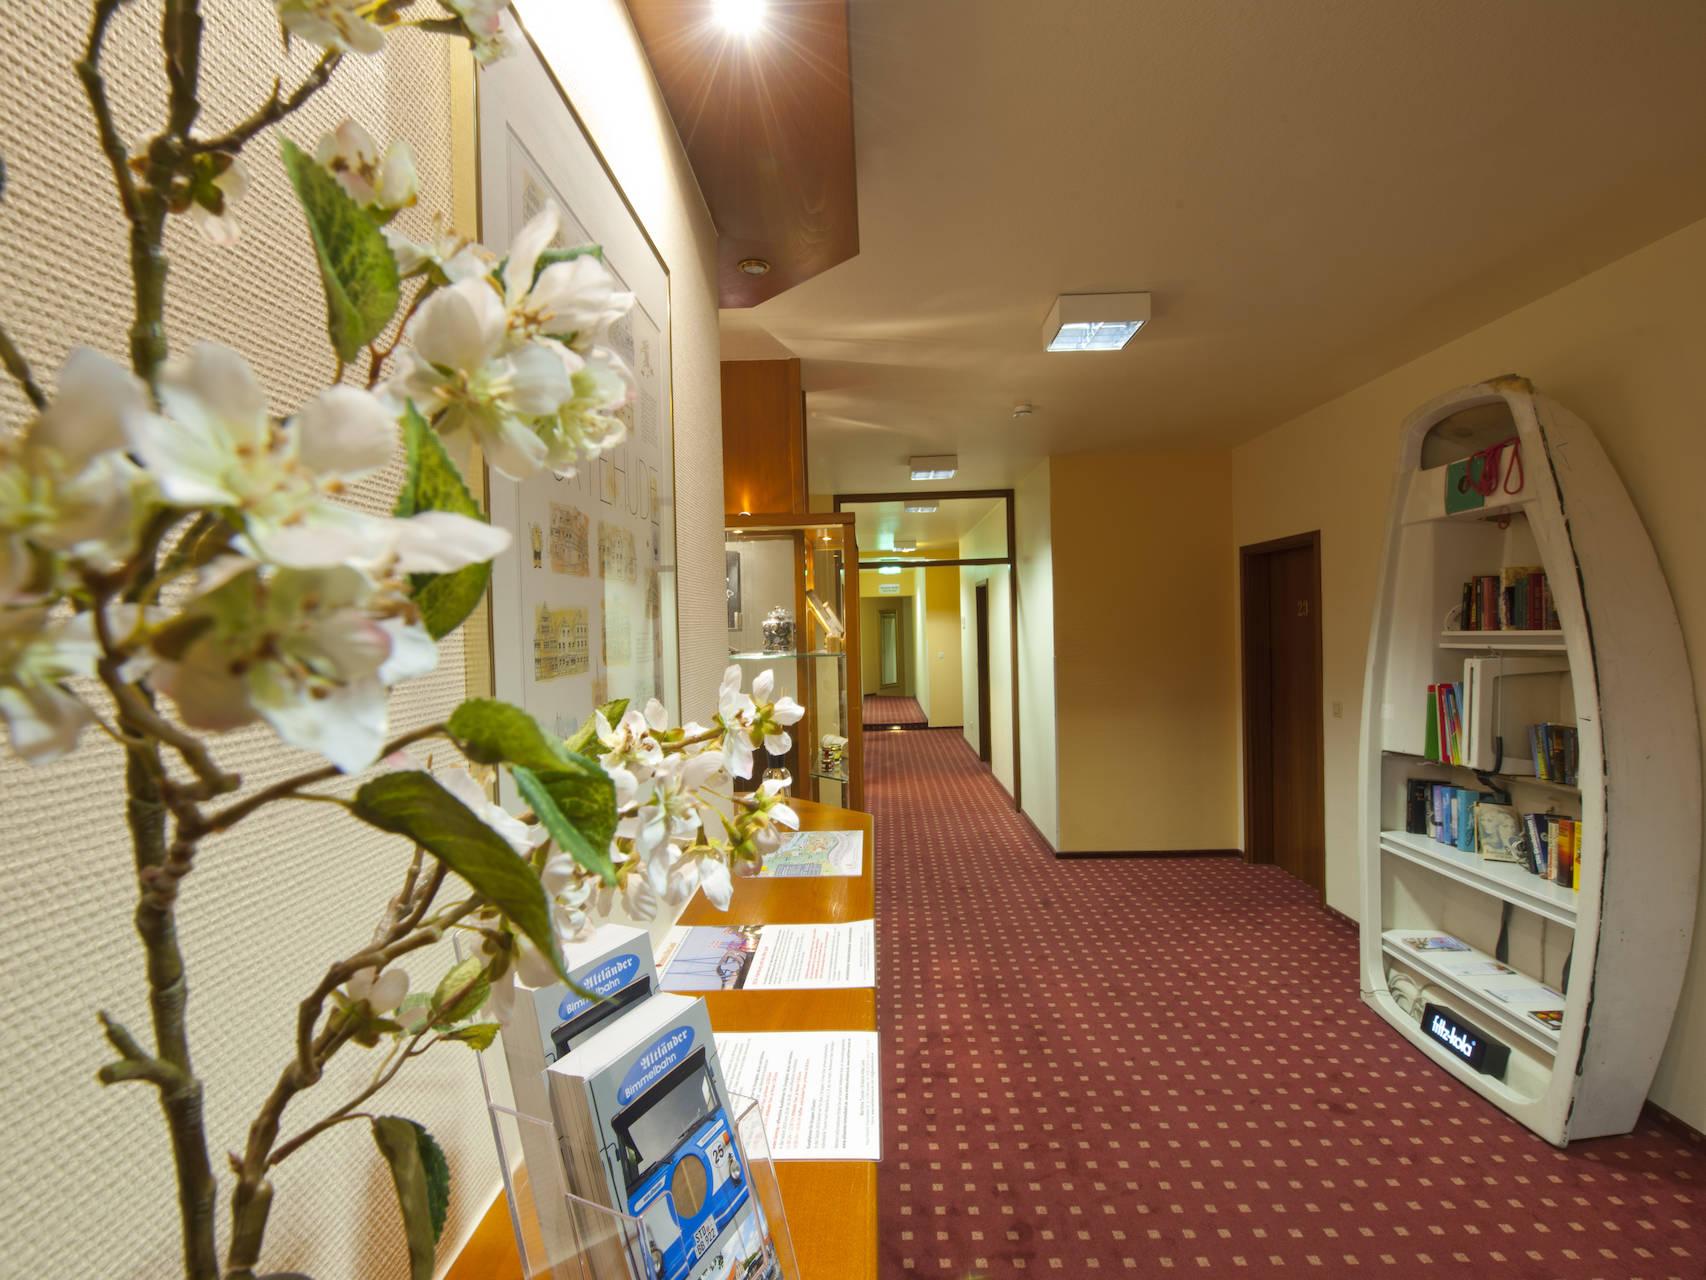 Flure Hotel am Stadtpark Buxtehude 4 uai